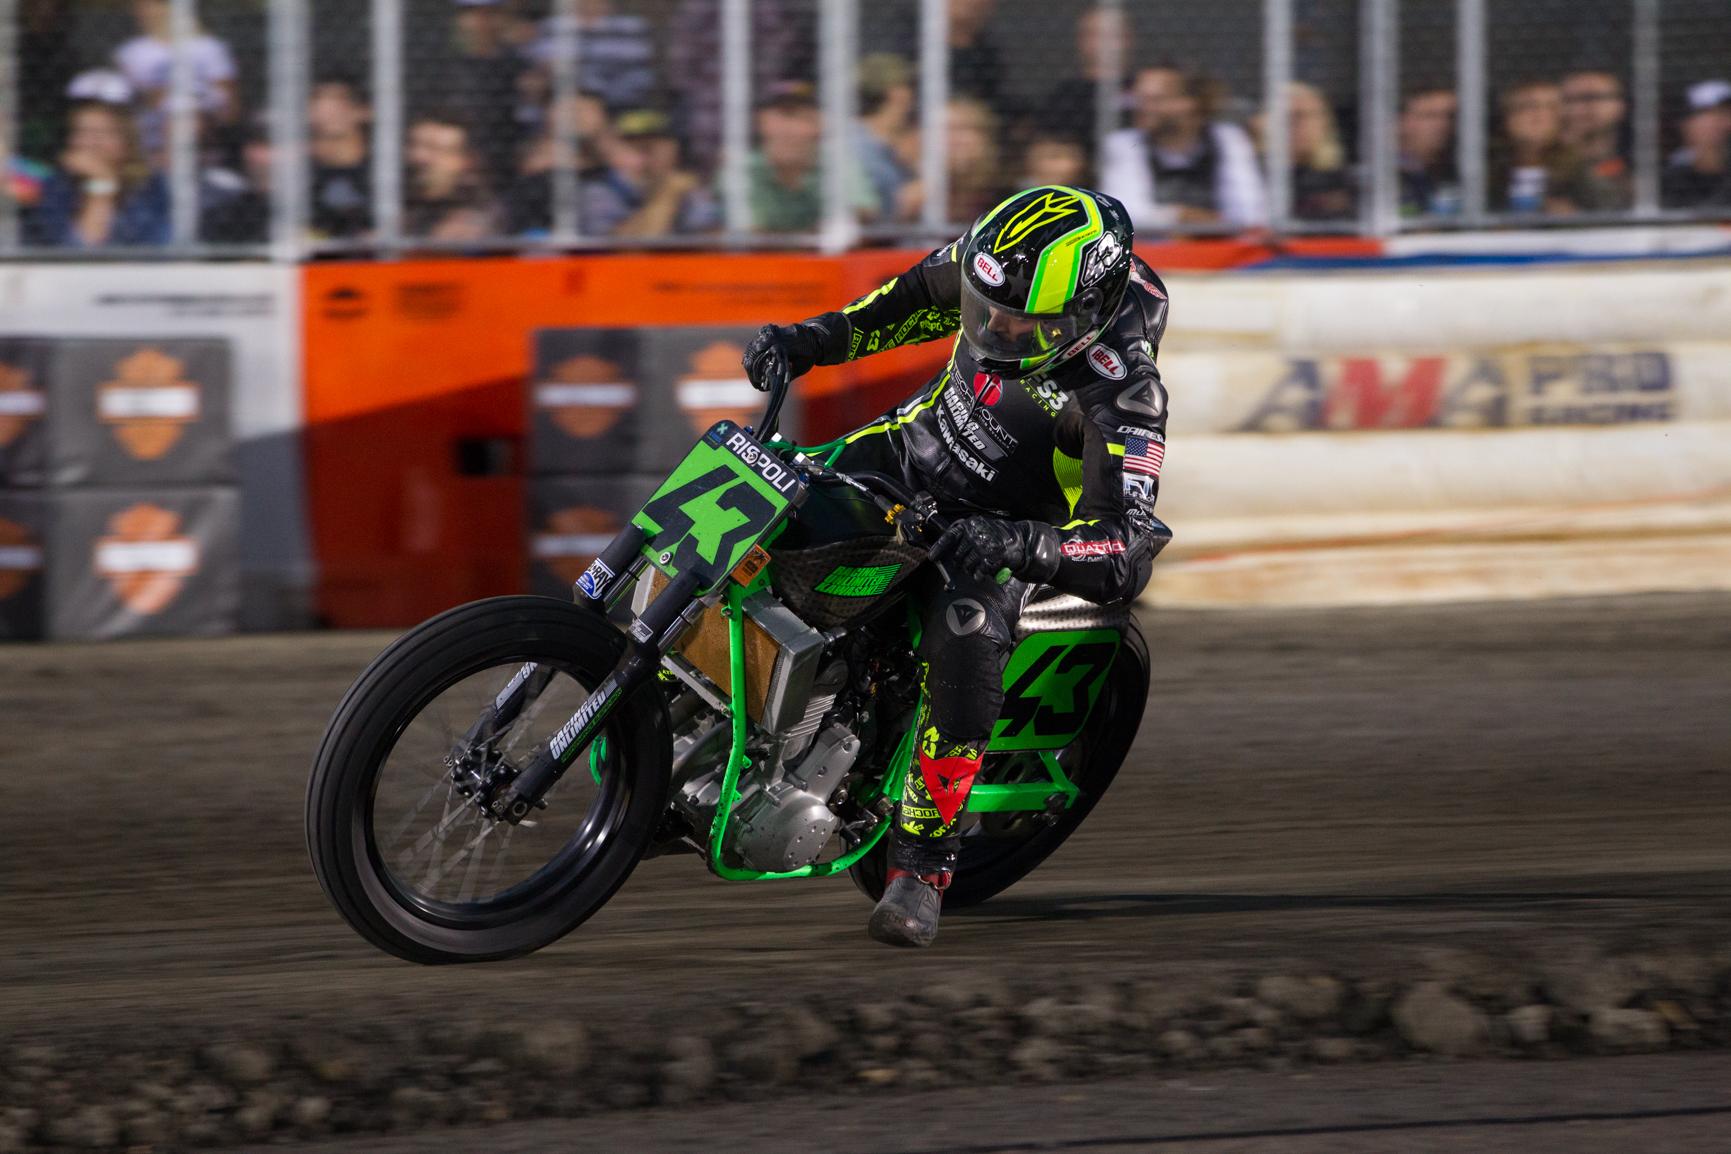 British Superbike phenom James Rispoli makes a return to AFT competition this Thursday at DAYTONA TT